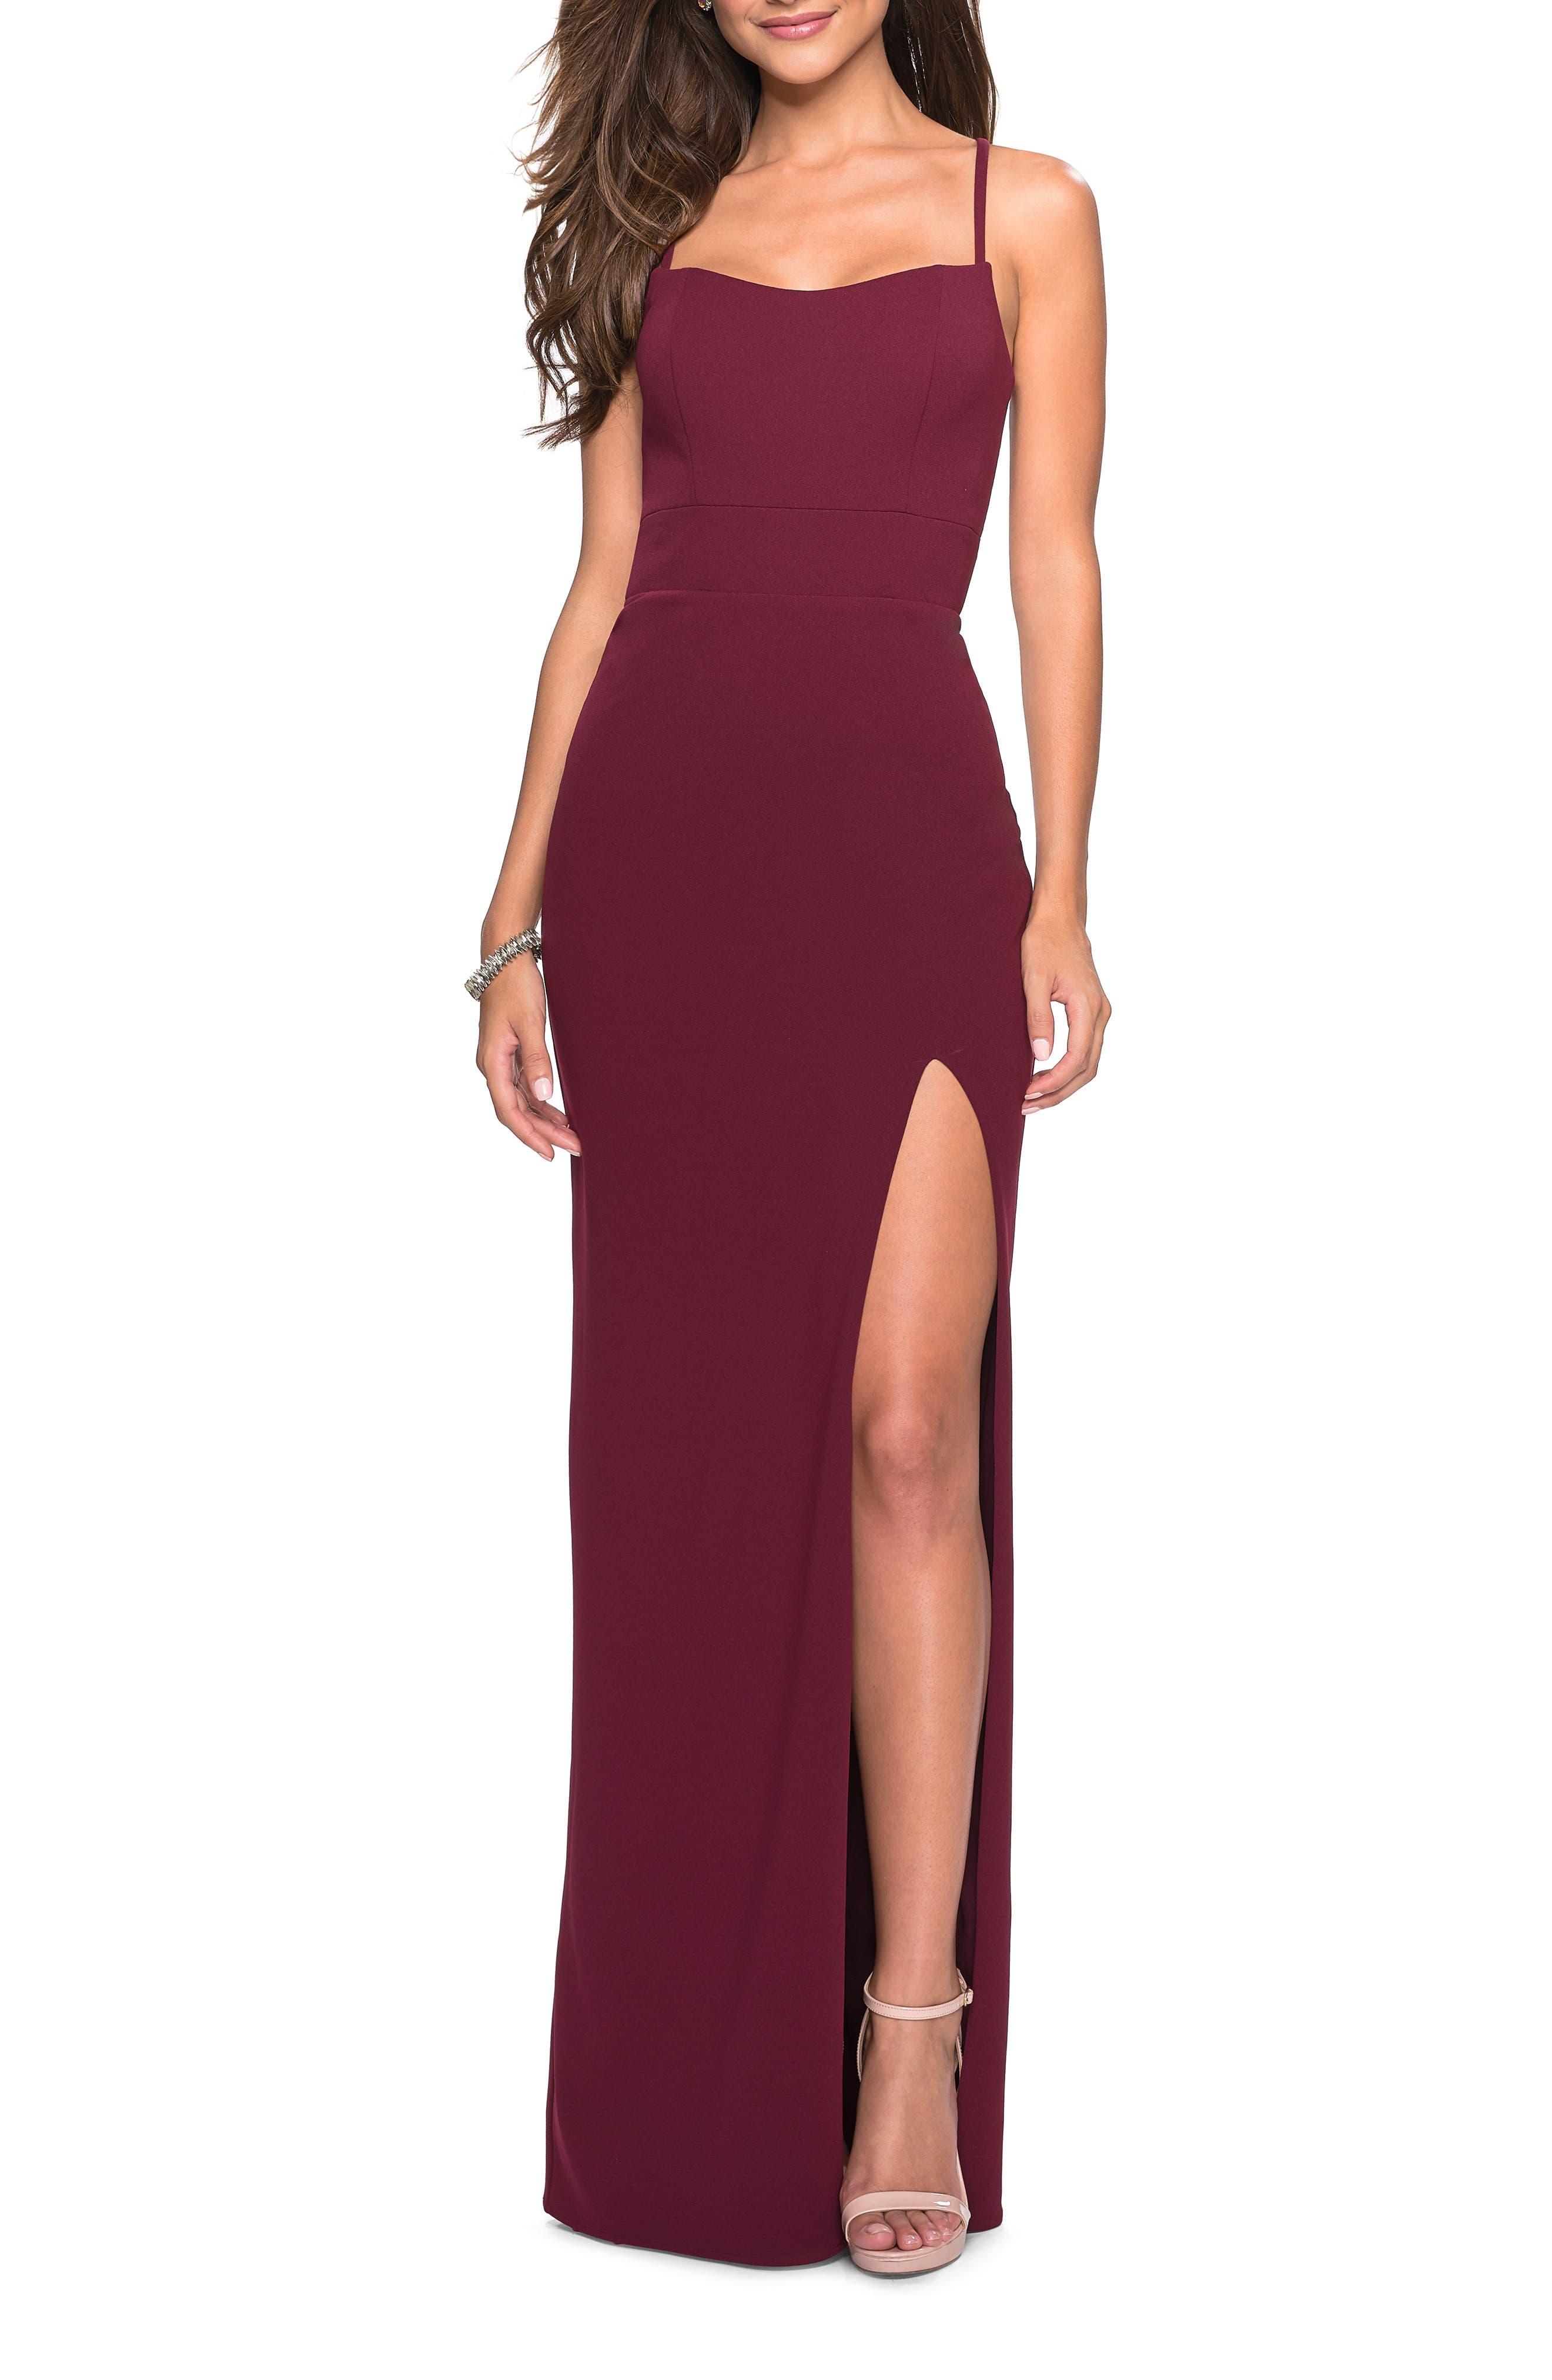 La Femme Sweetheart Neck Jersey Evening Dress, Burgundy